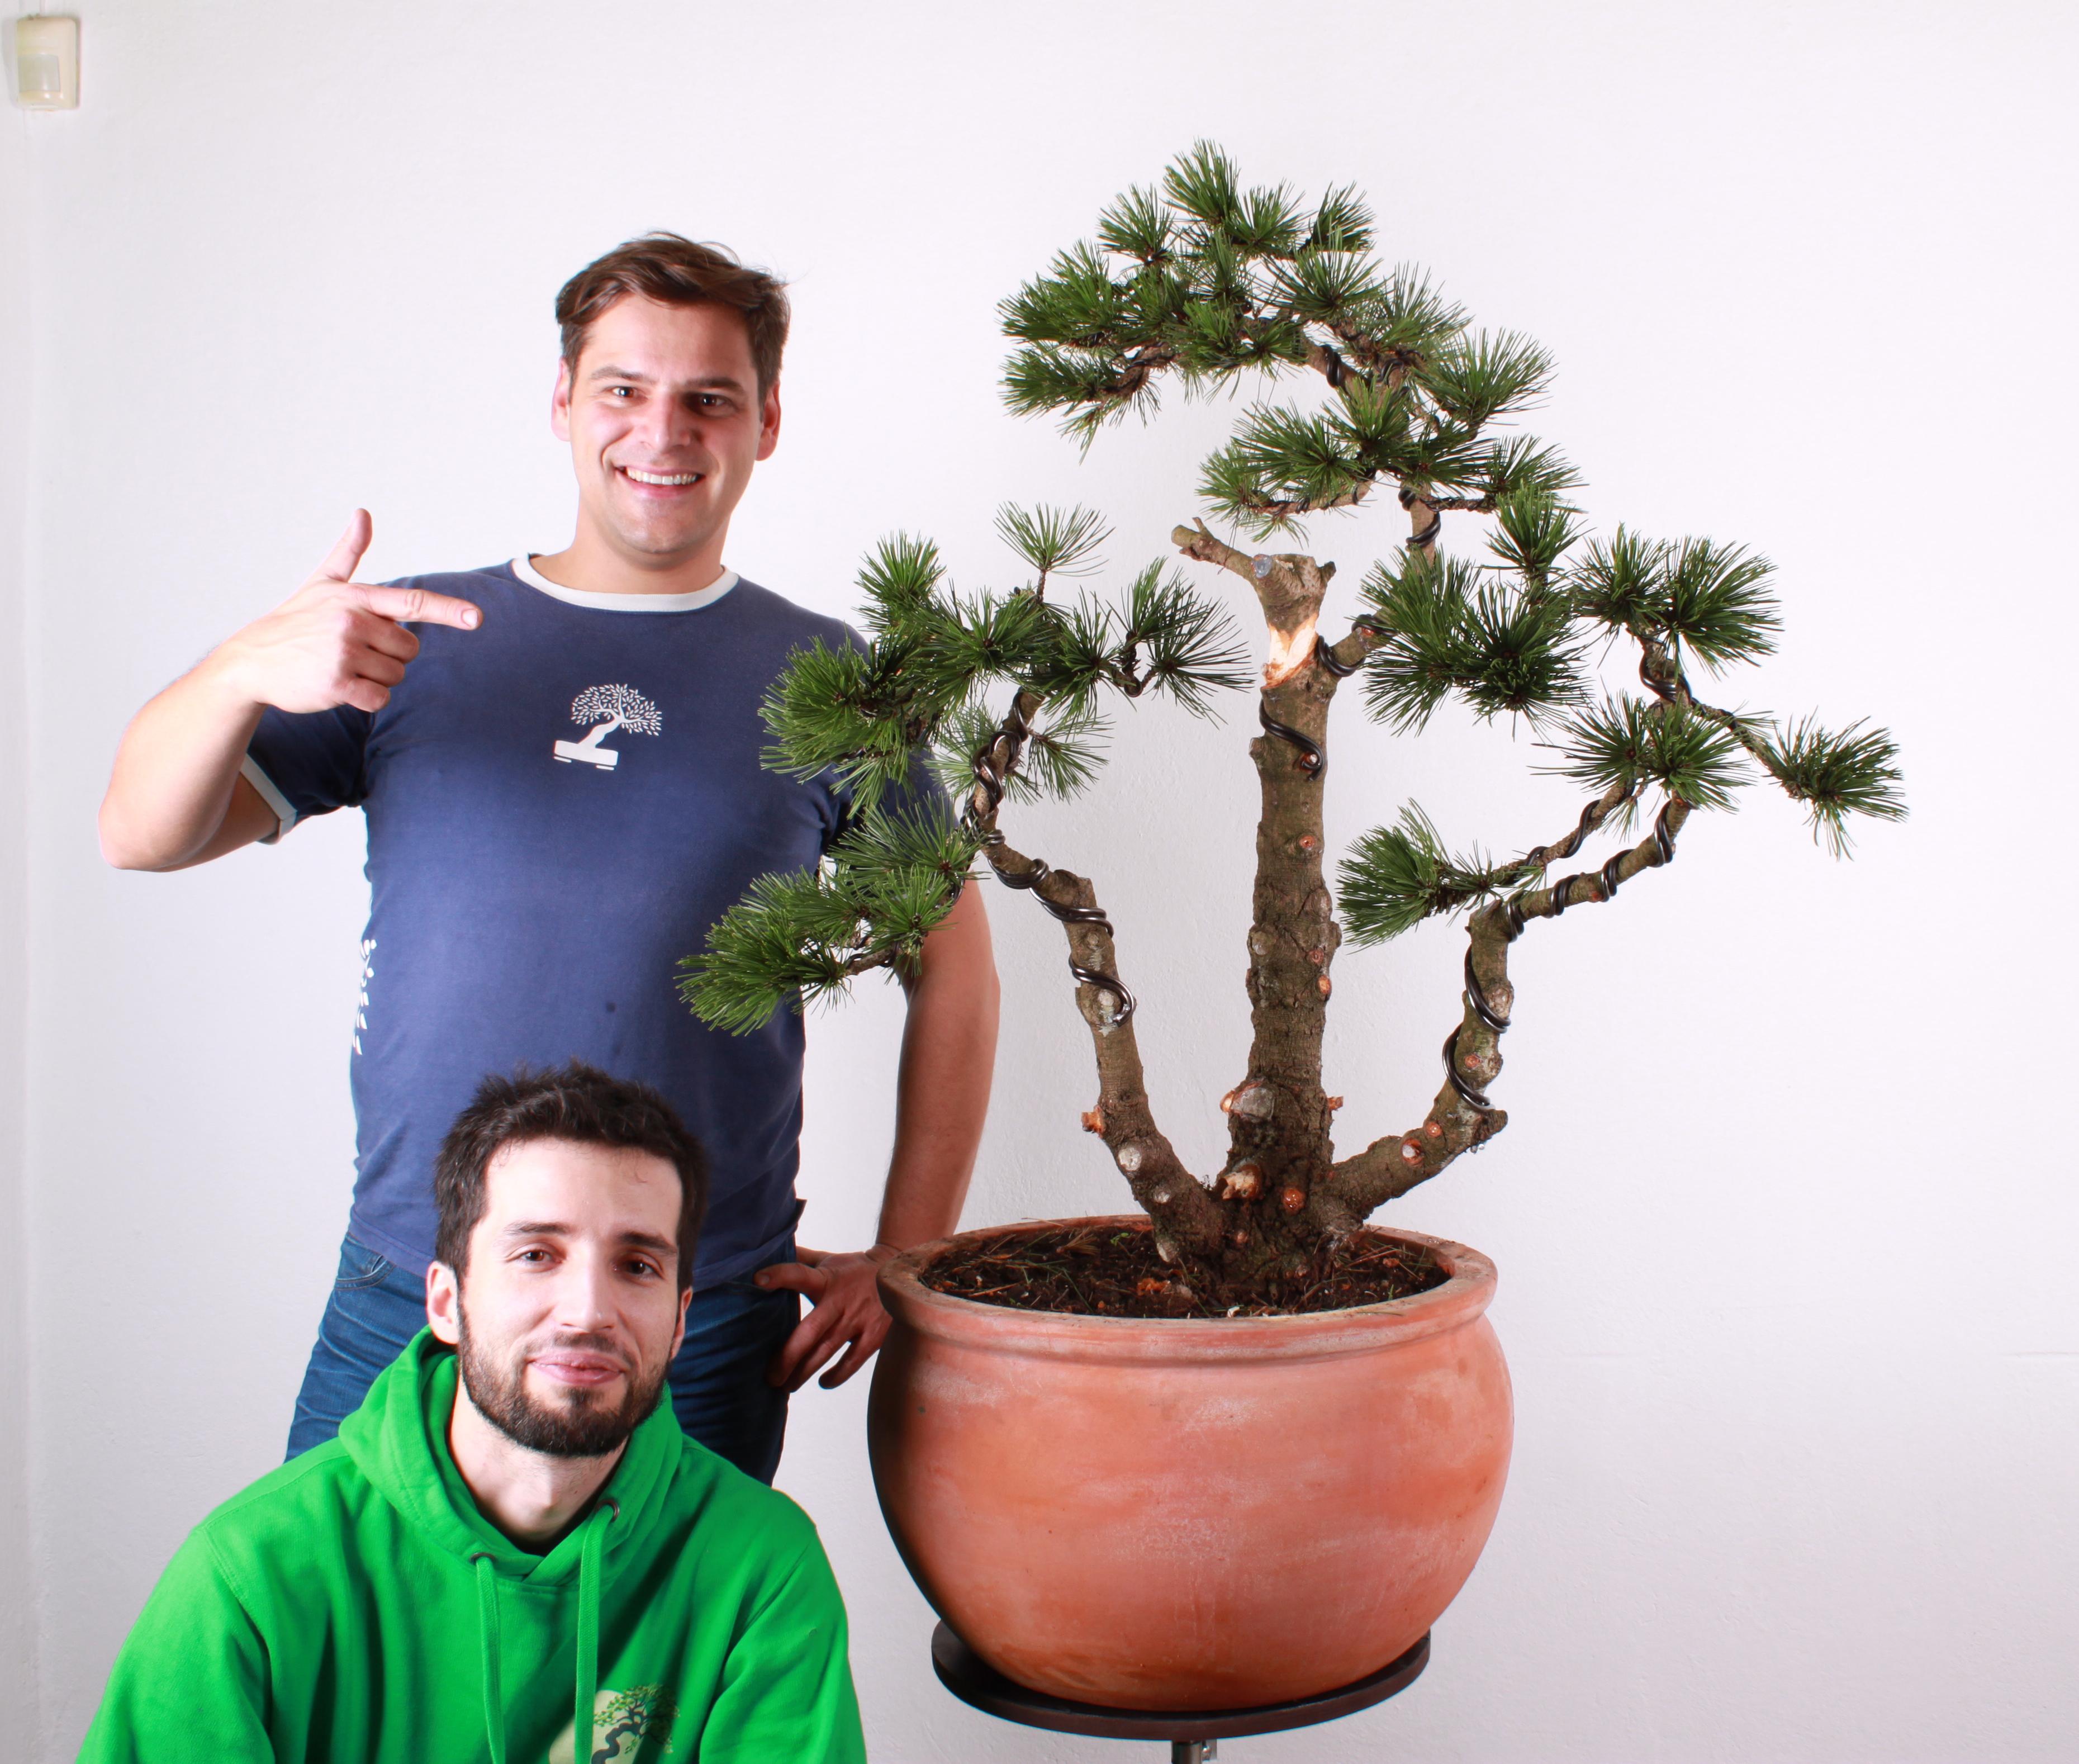 Strom po prvom tvarovaní